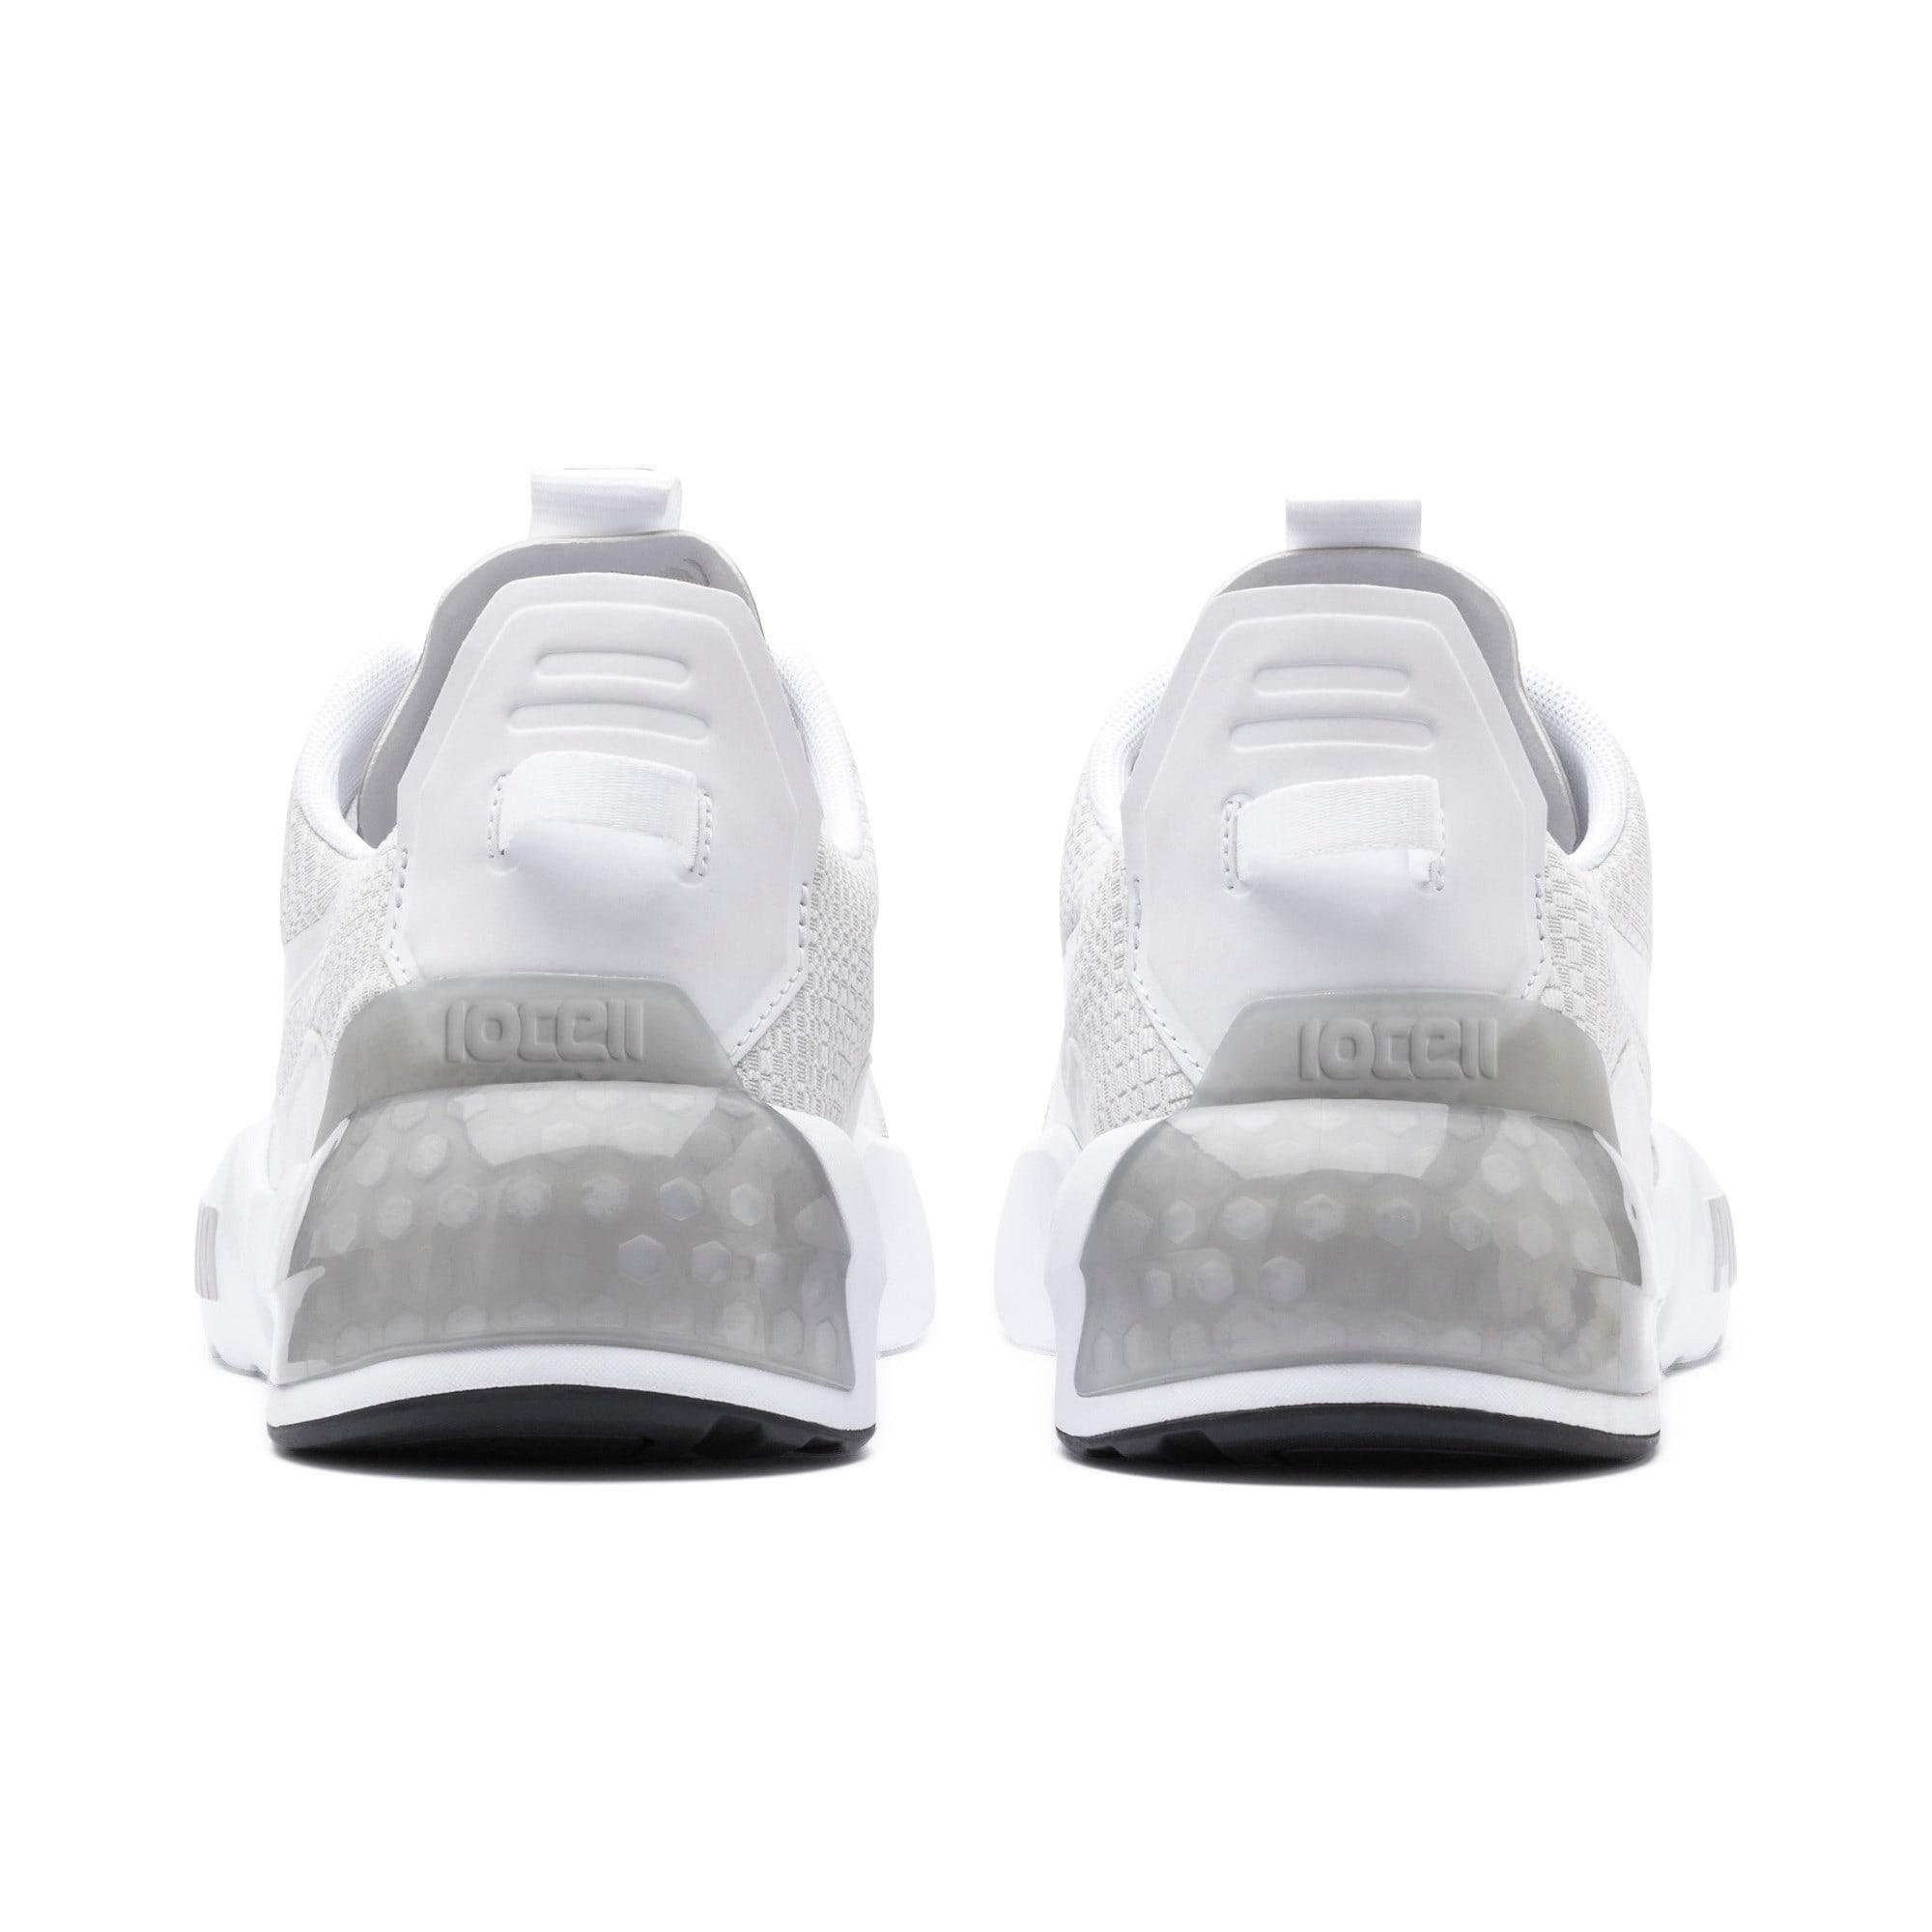 Thumbnail 4 of CELL Phase Lights Men's Training Shoes, Puma White-Gray Violet, medium